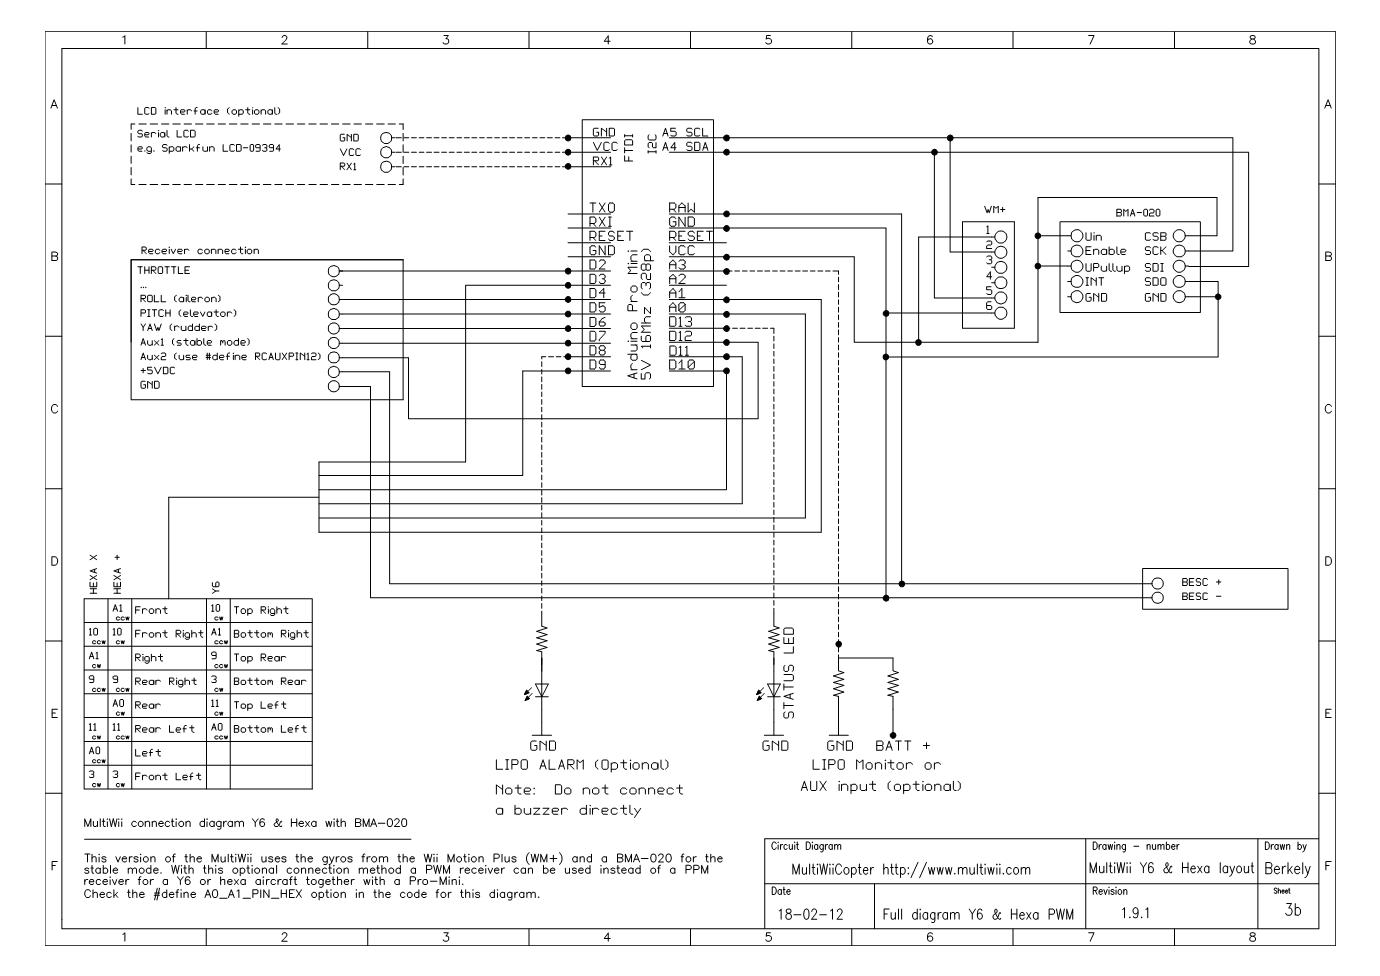 medium resolution of quadcopter wiring diagram multiwii 328p kk2 wiring wiring quadcopter ardupilot wiring diagrams diy quadcopter schematics